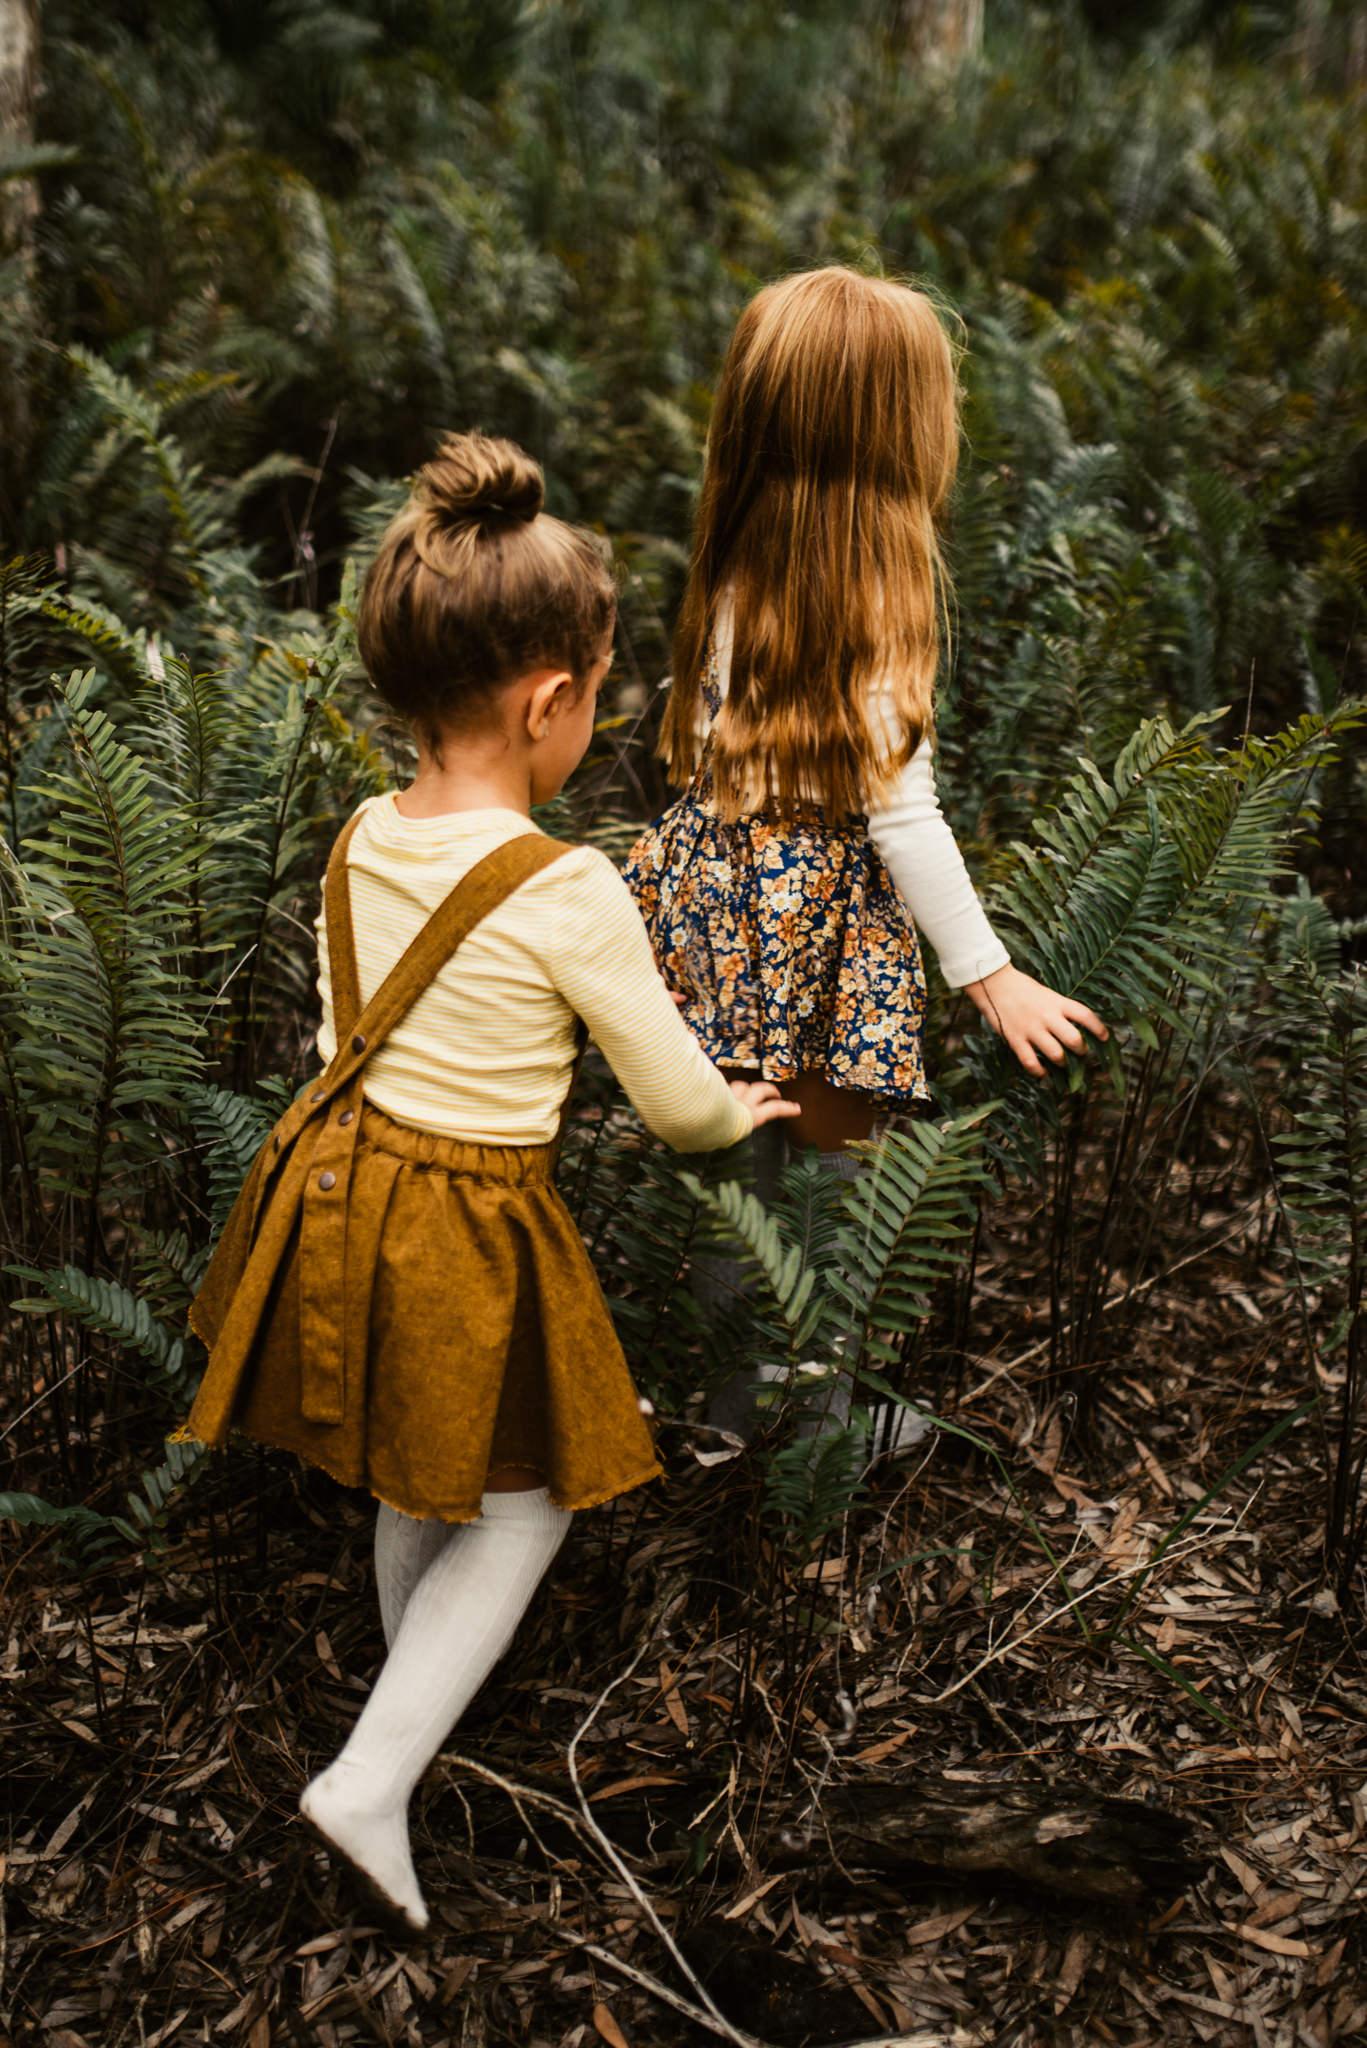 twyla jones photography - treasure coast florida - childrens adventure clothing commercial shoot--13.jpg